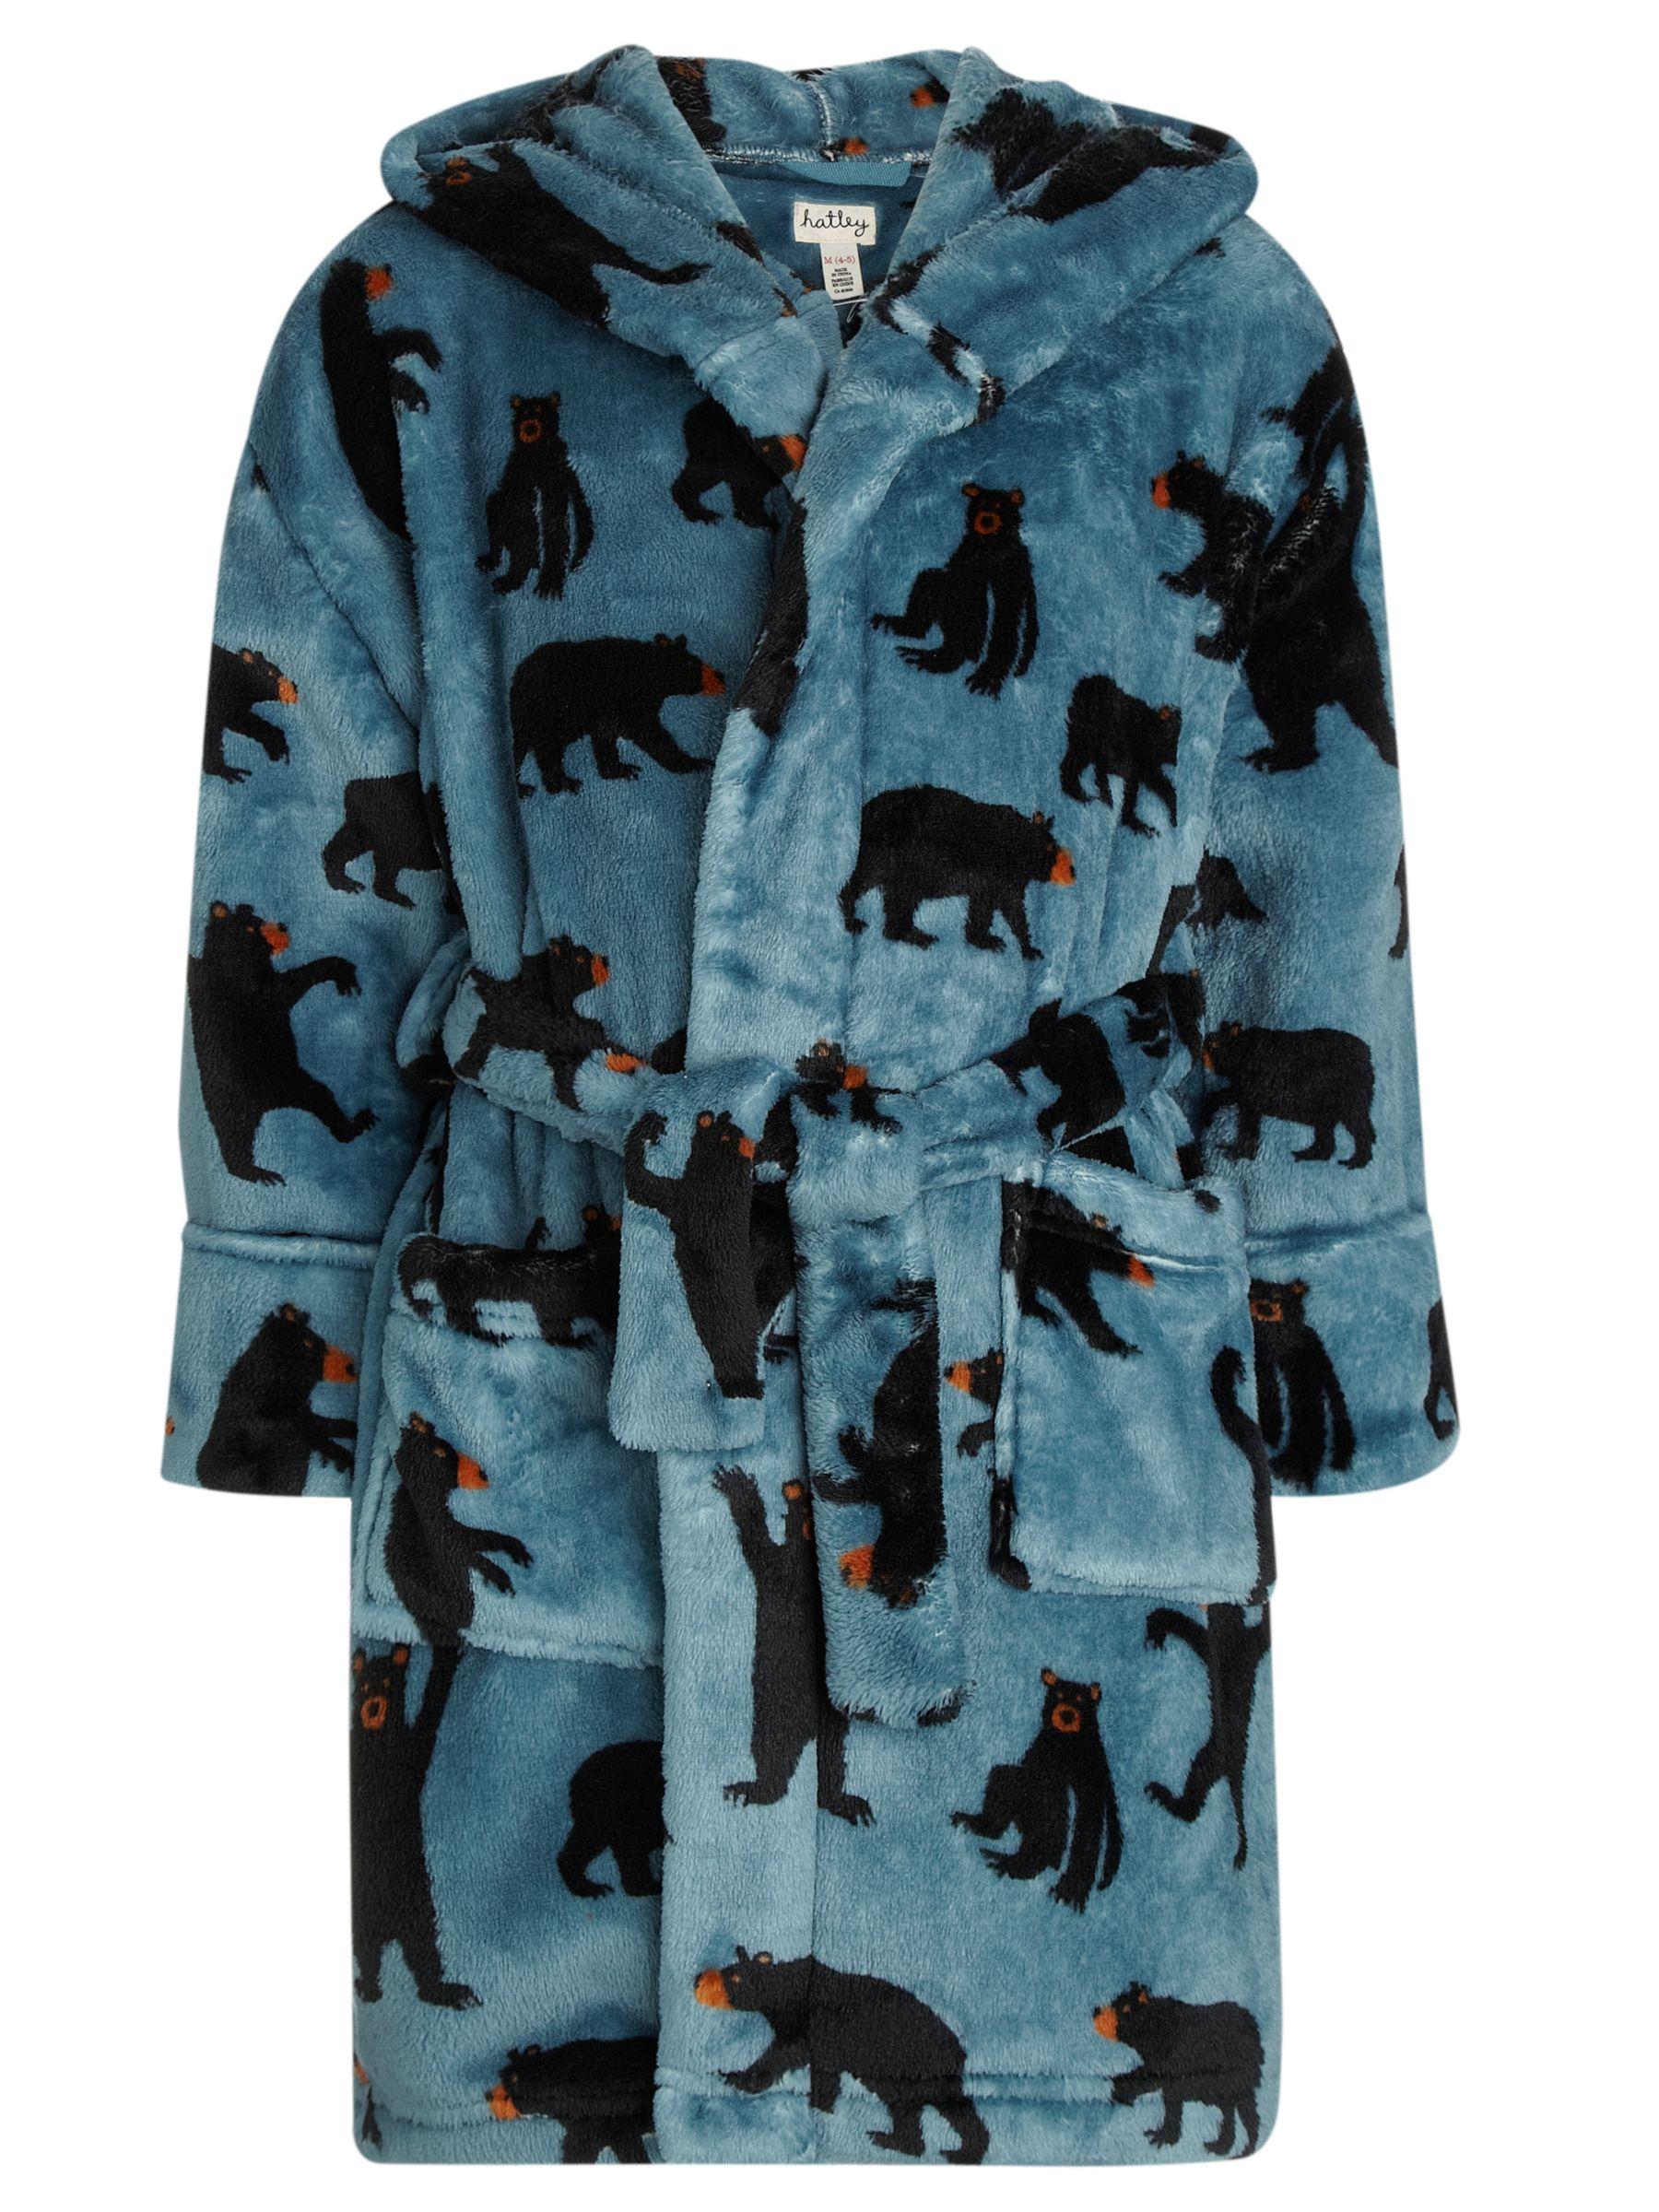 Hatley Black Bears Robe, Blue